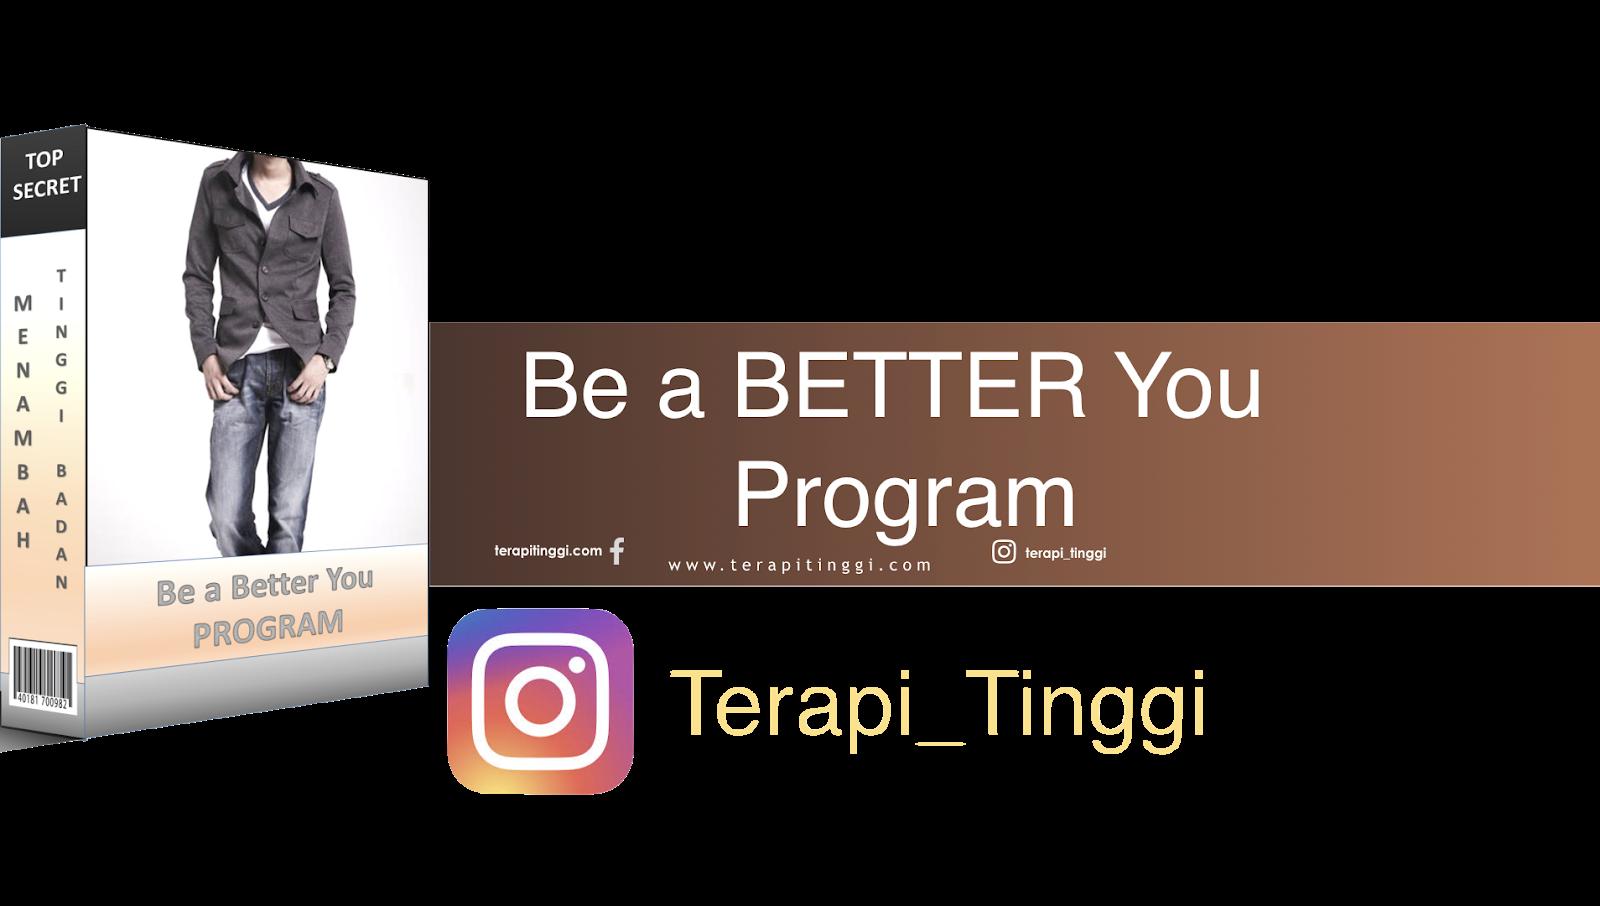 Program Terapi Tinggi